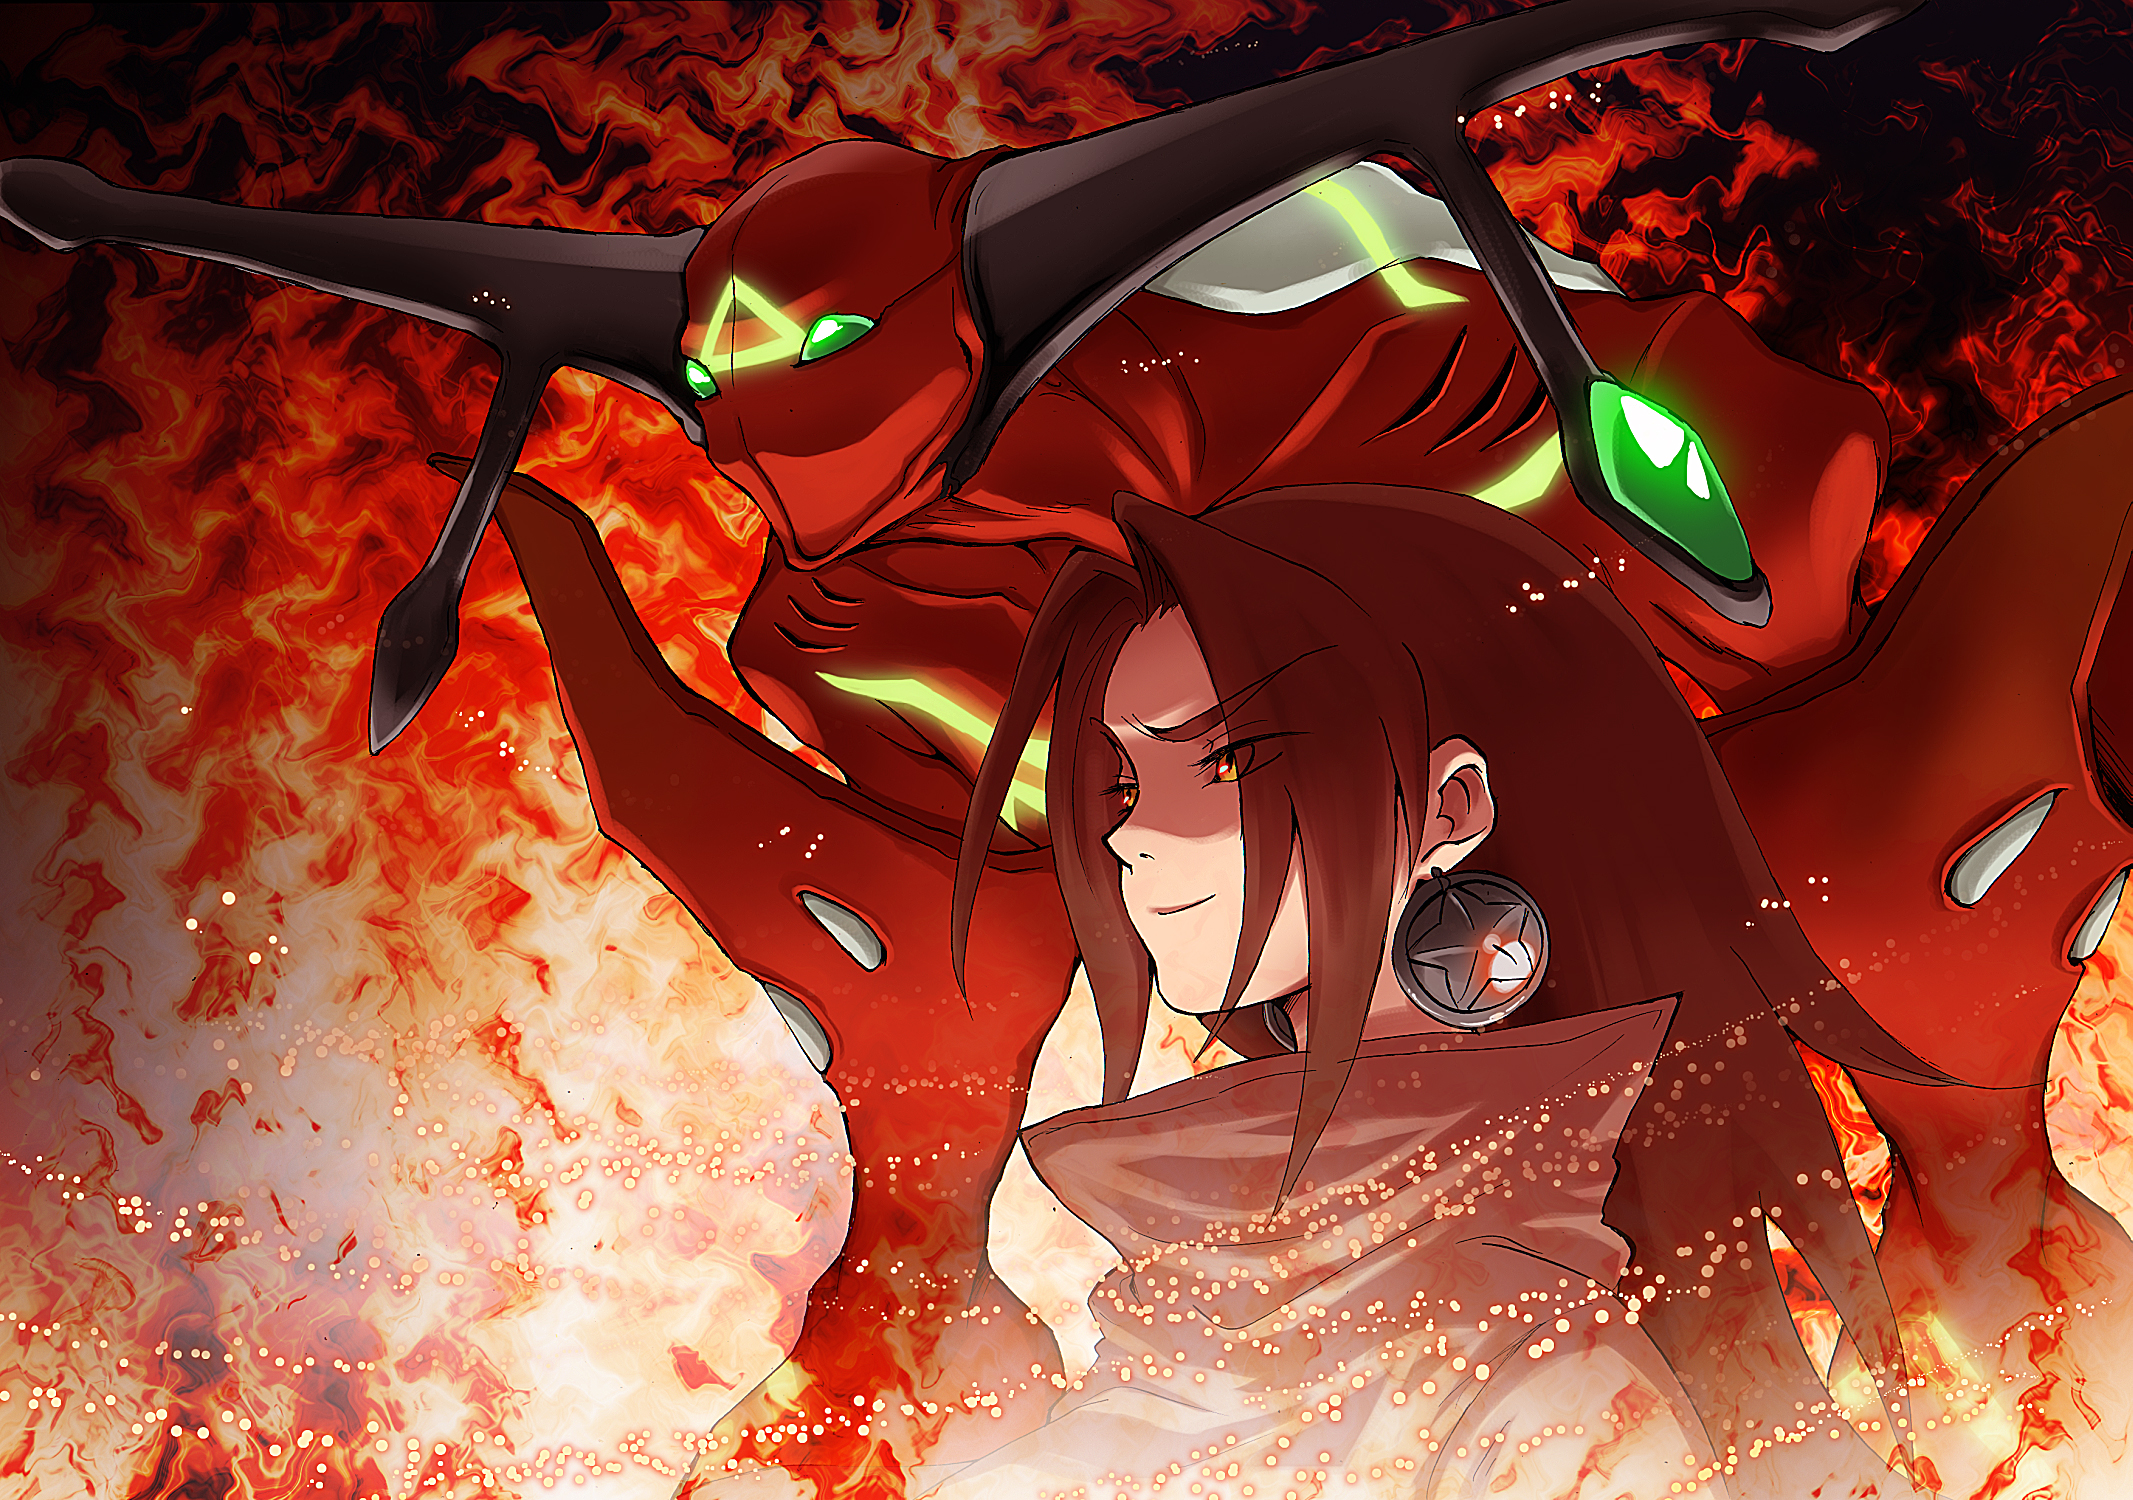 Spirit Of Fire Hd Wallpaper Background Image 2133x1500 Id